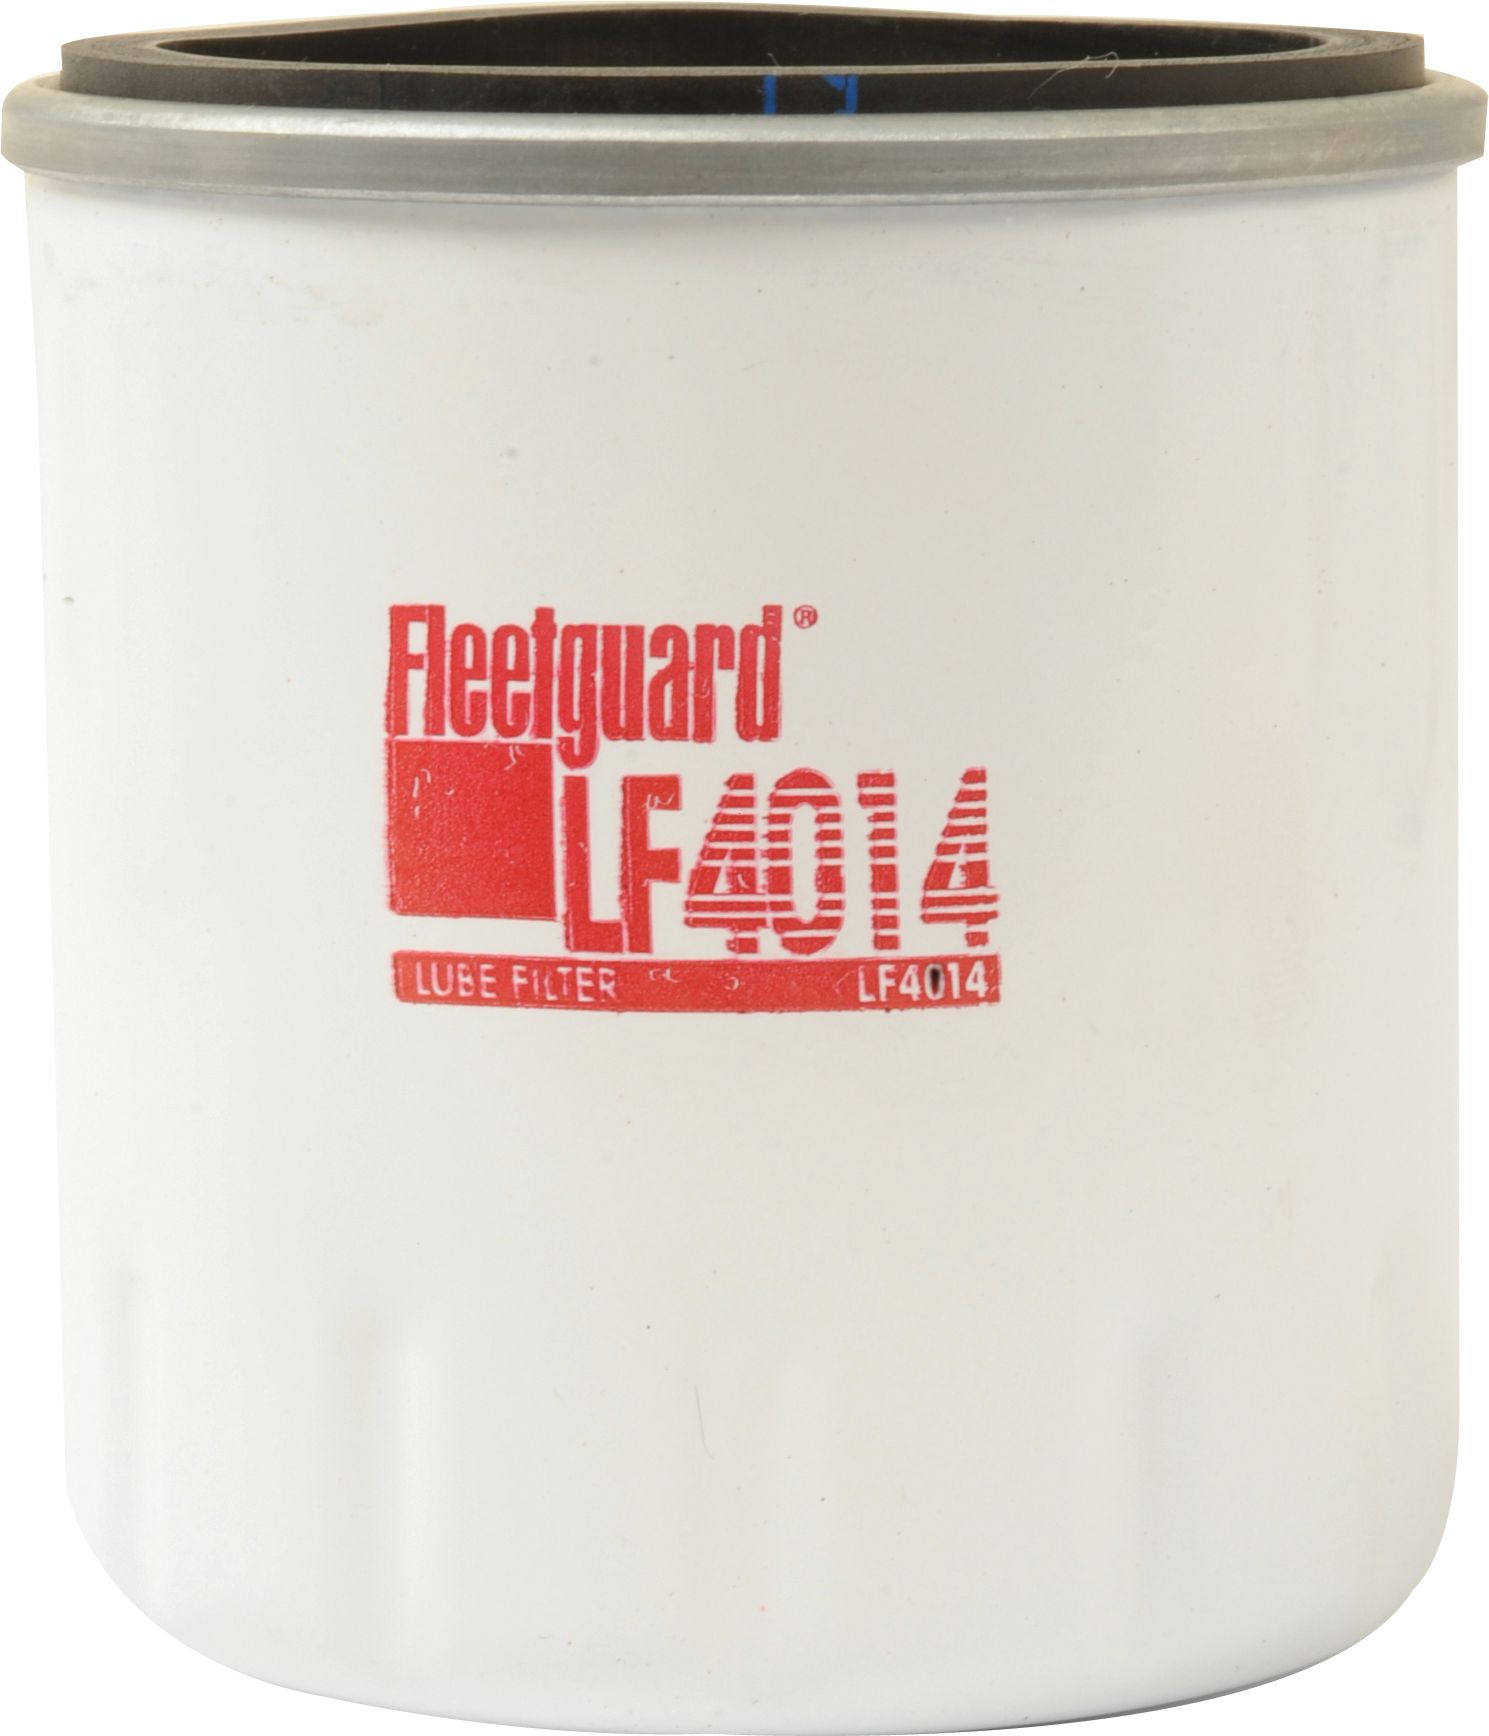 CLAAS OIL FILTER LF4014